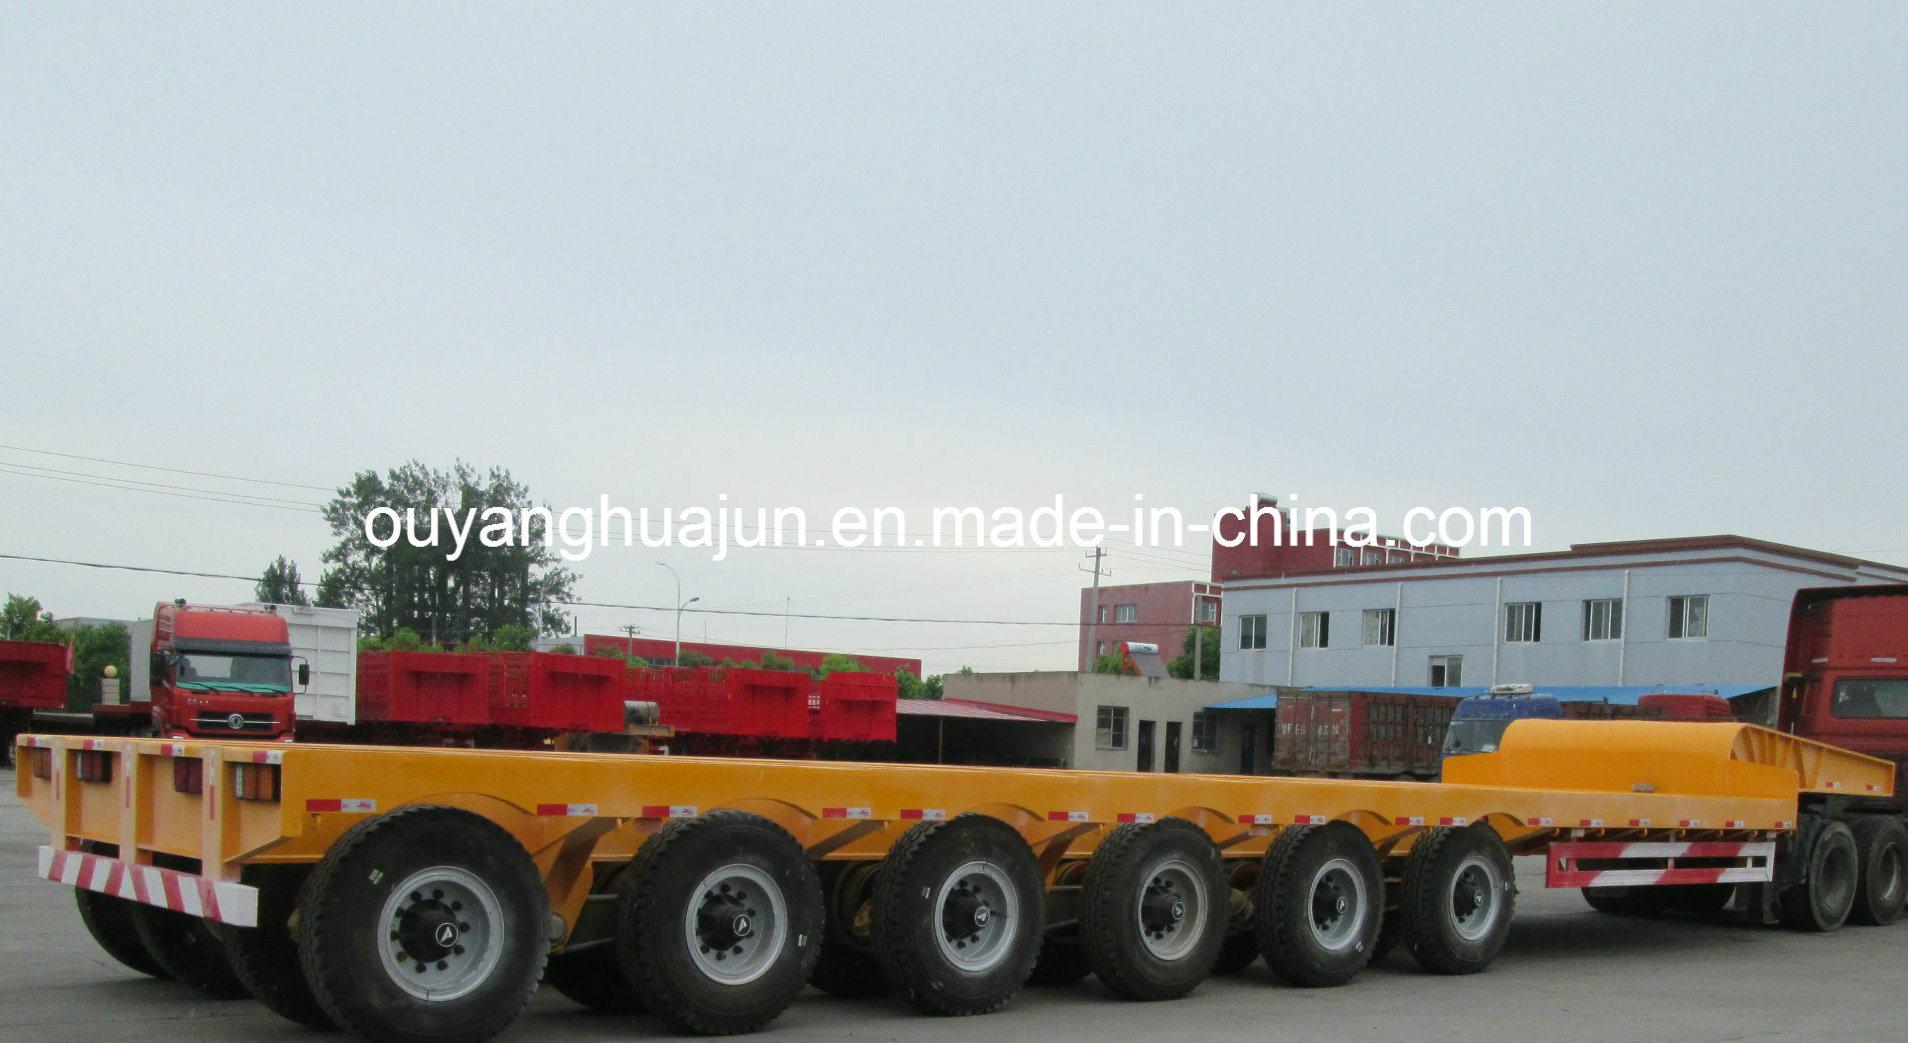 2 Axles Super Low Bed Flatbed Semitrailer